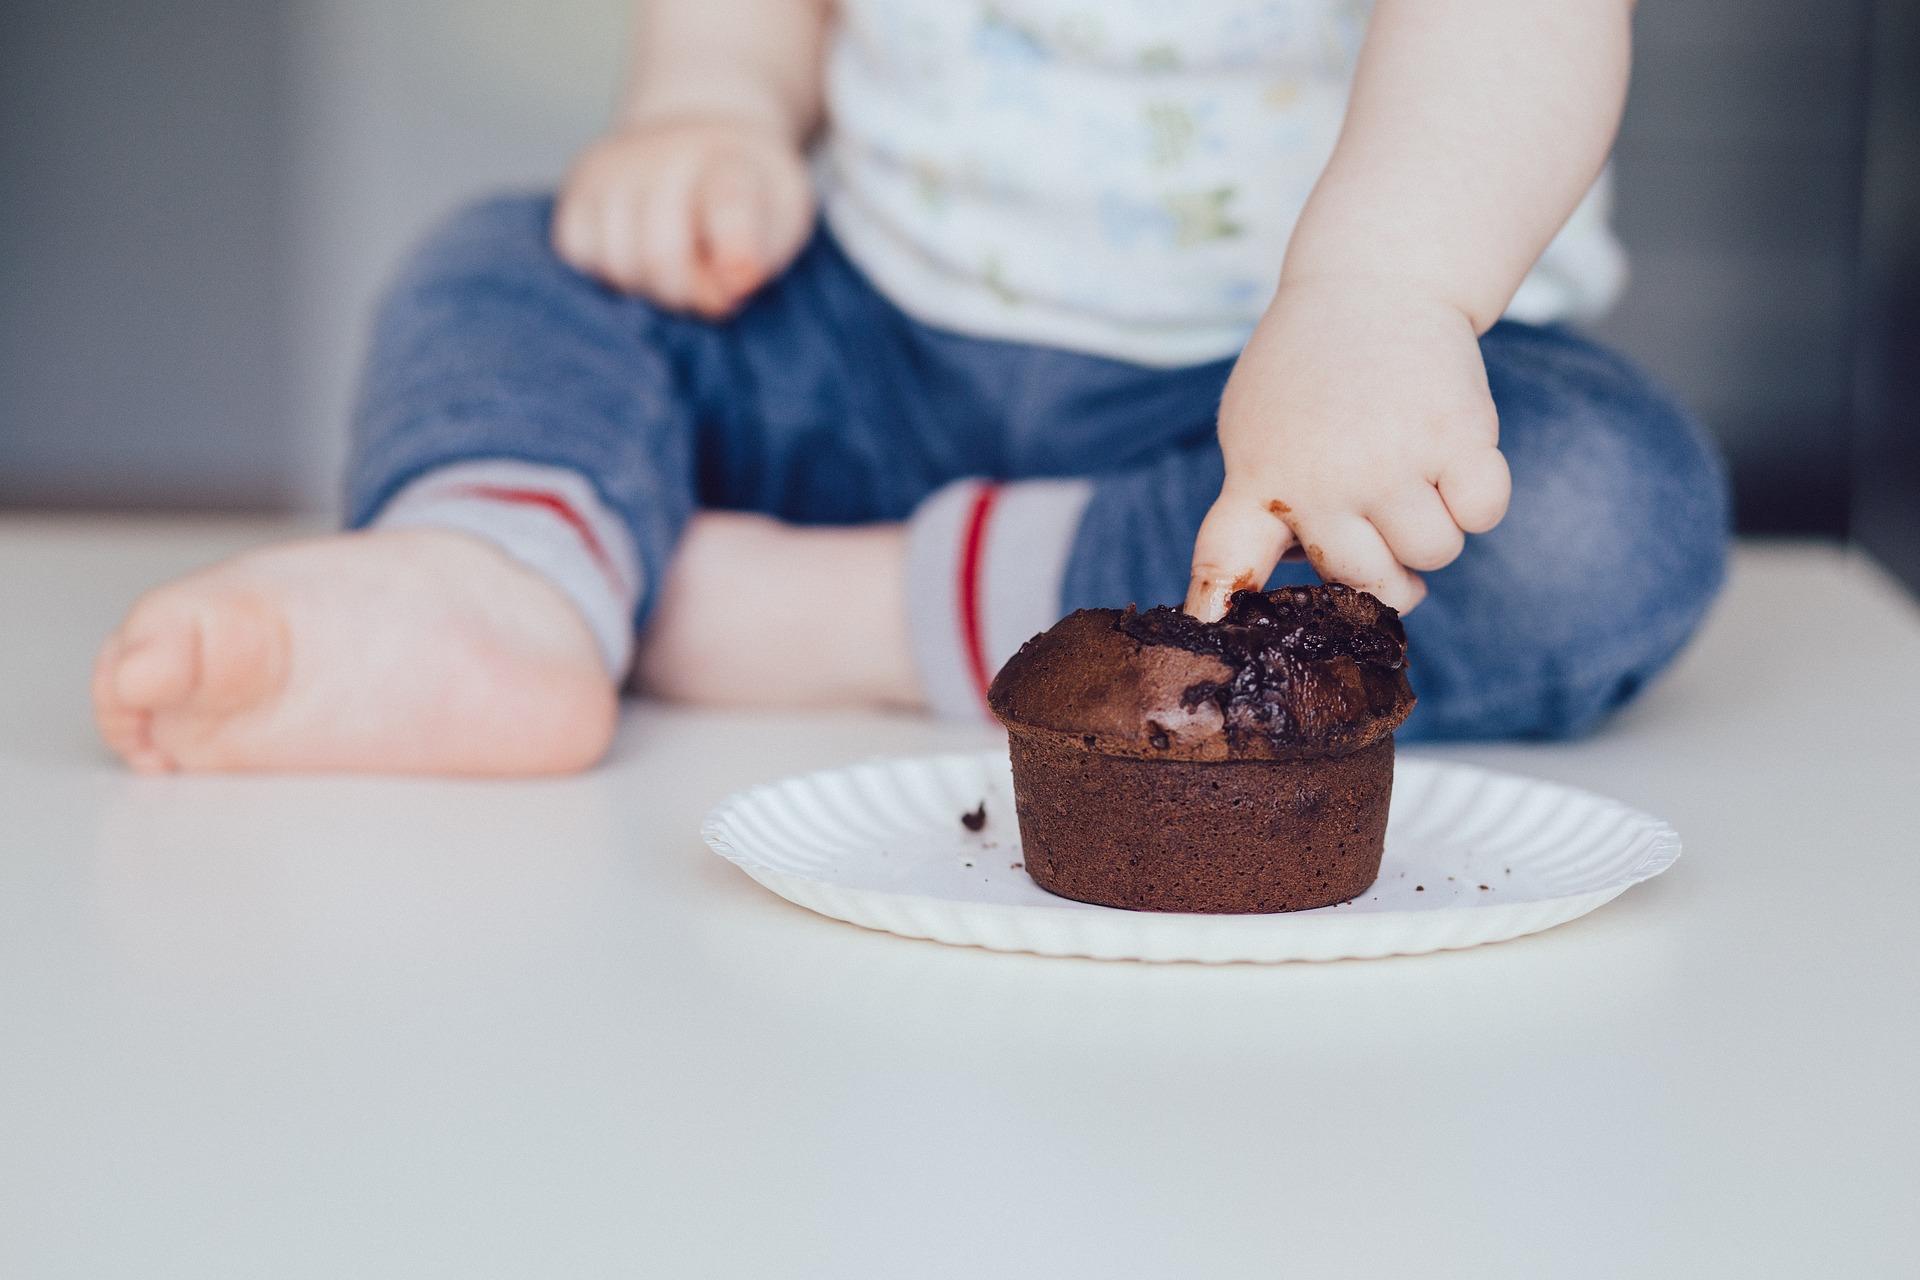 cupcake-2940558_1920